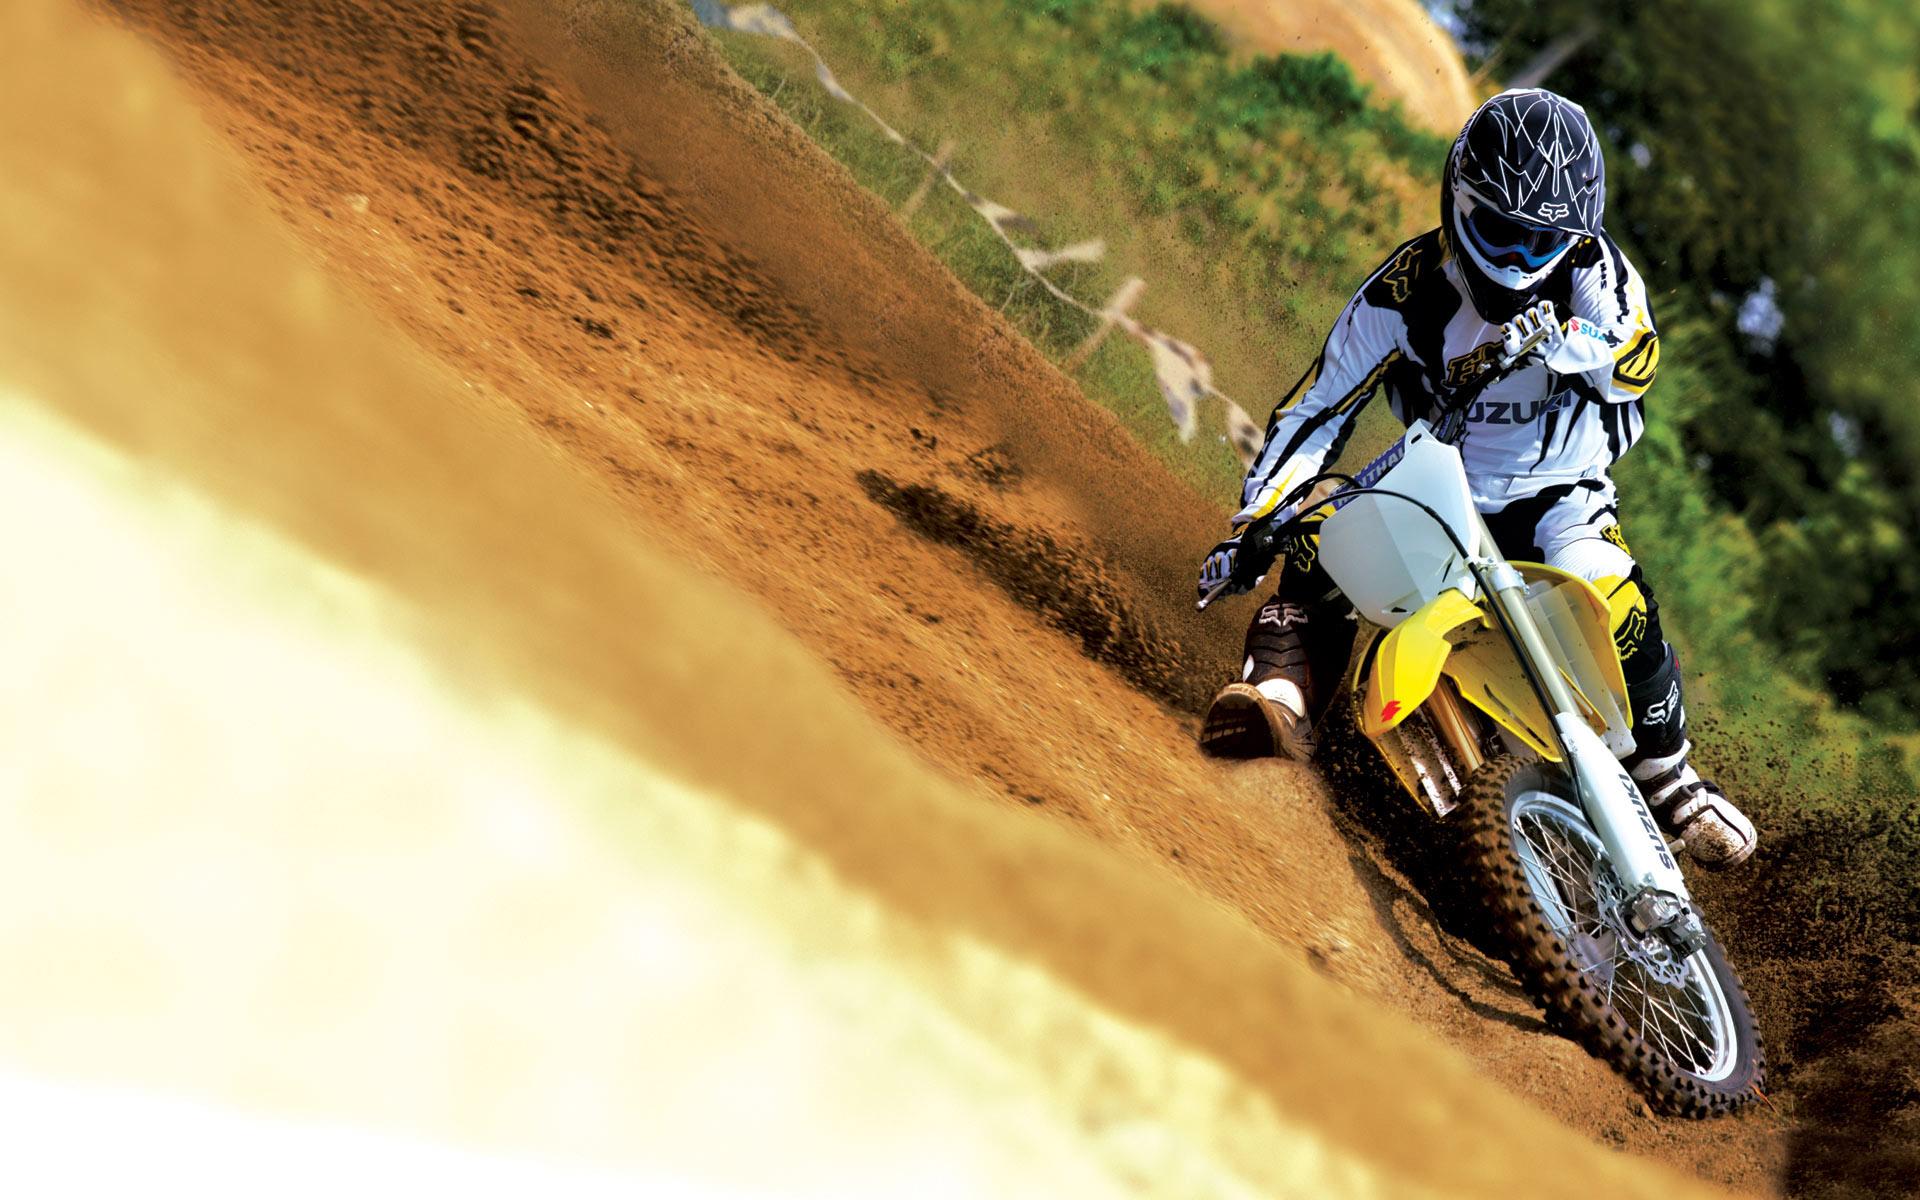 suzuki motocross bike hd - photo #4